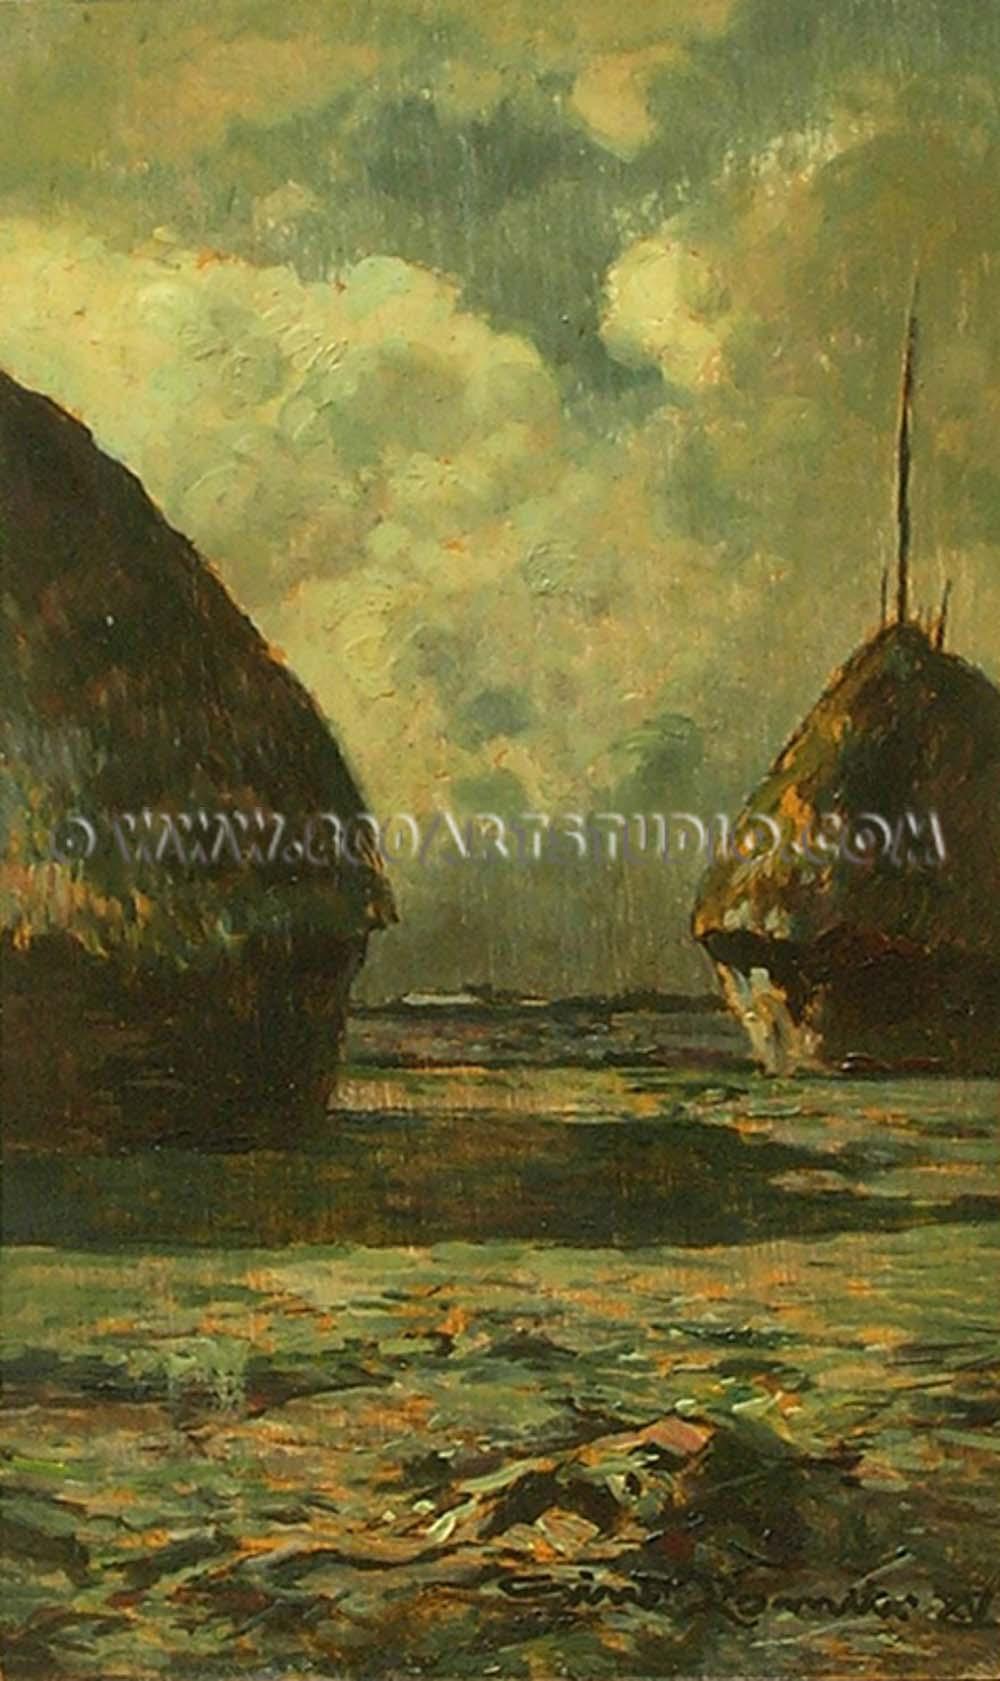 Gino Romiti - Paesaggio toscano